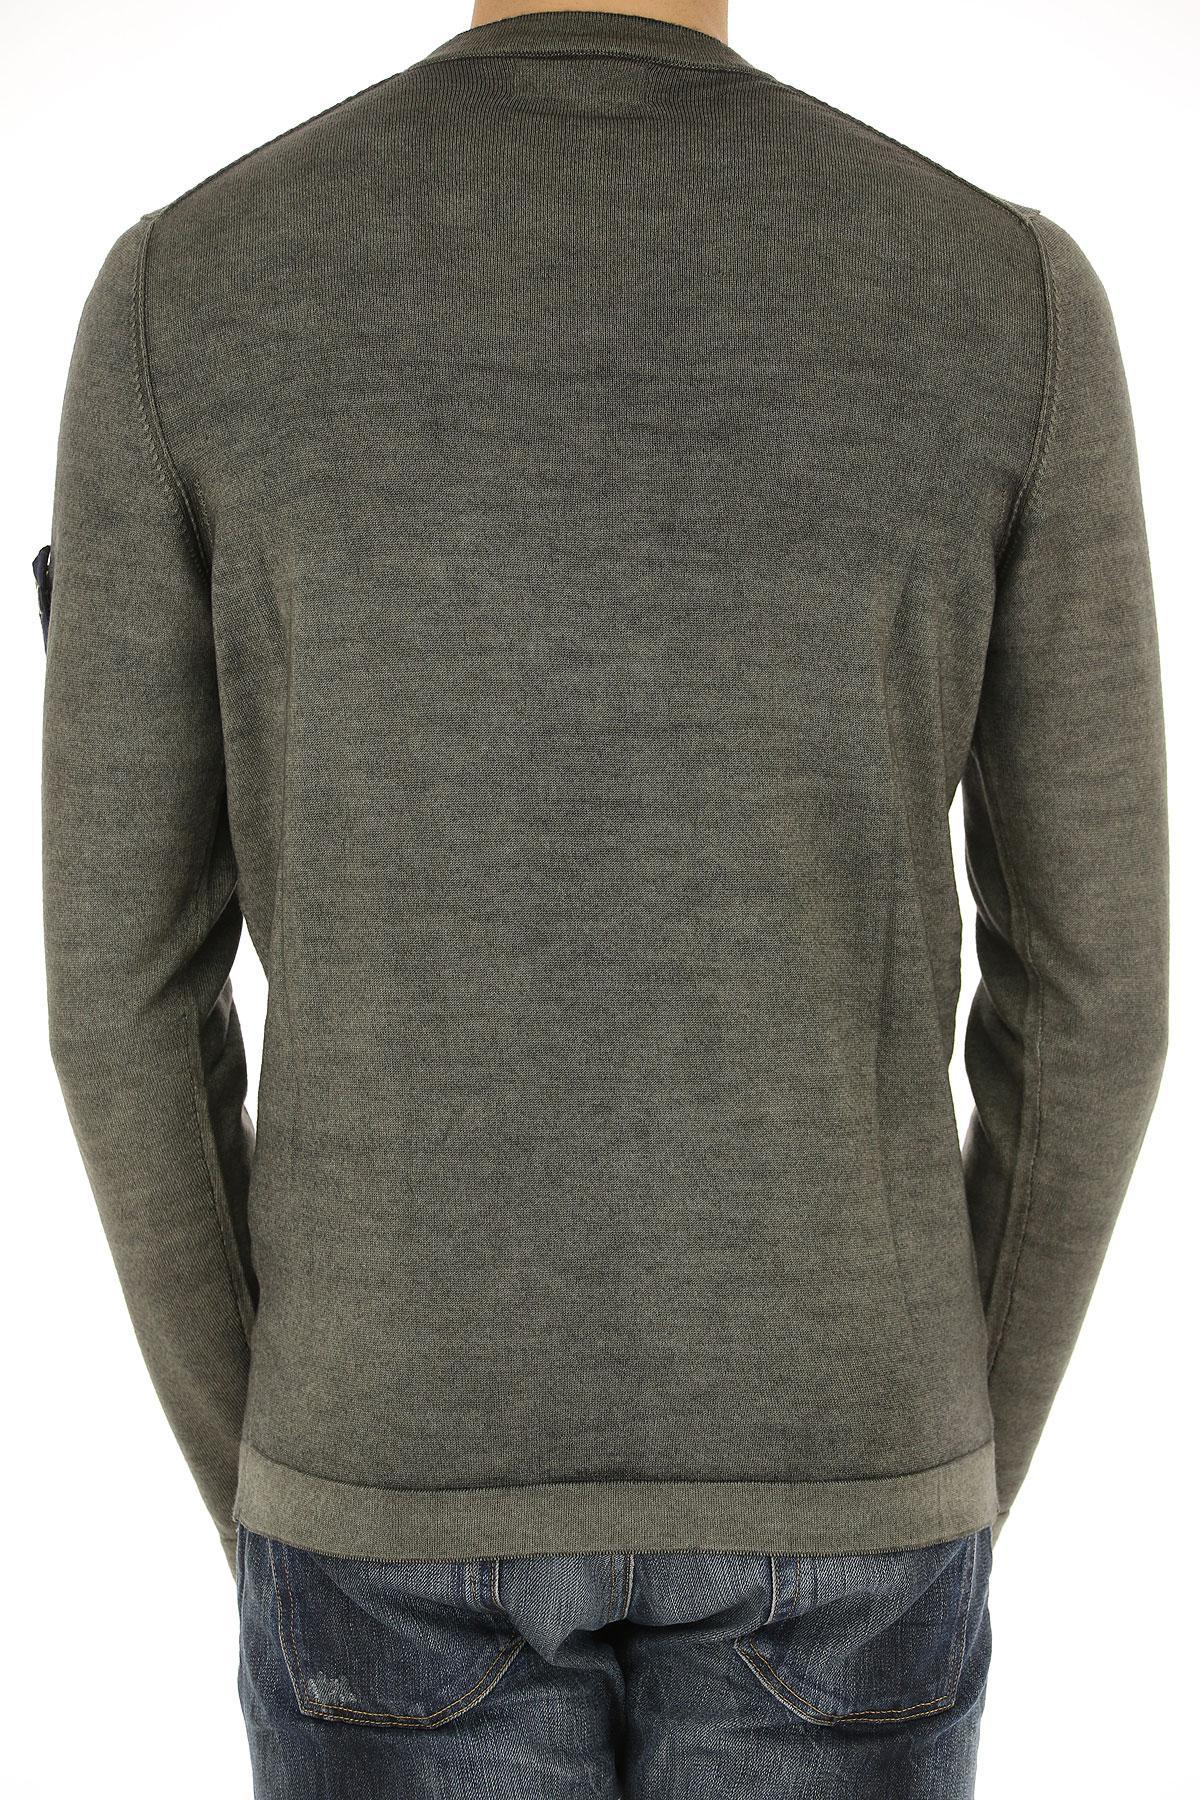 Stone Island Wool Clothing For Men for Men